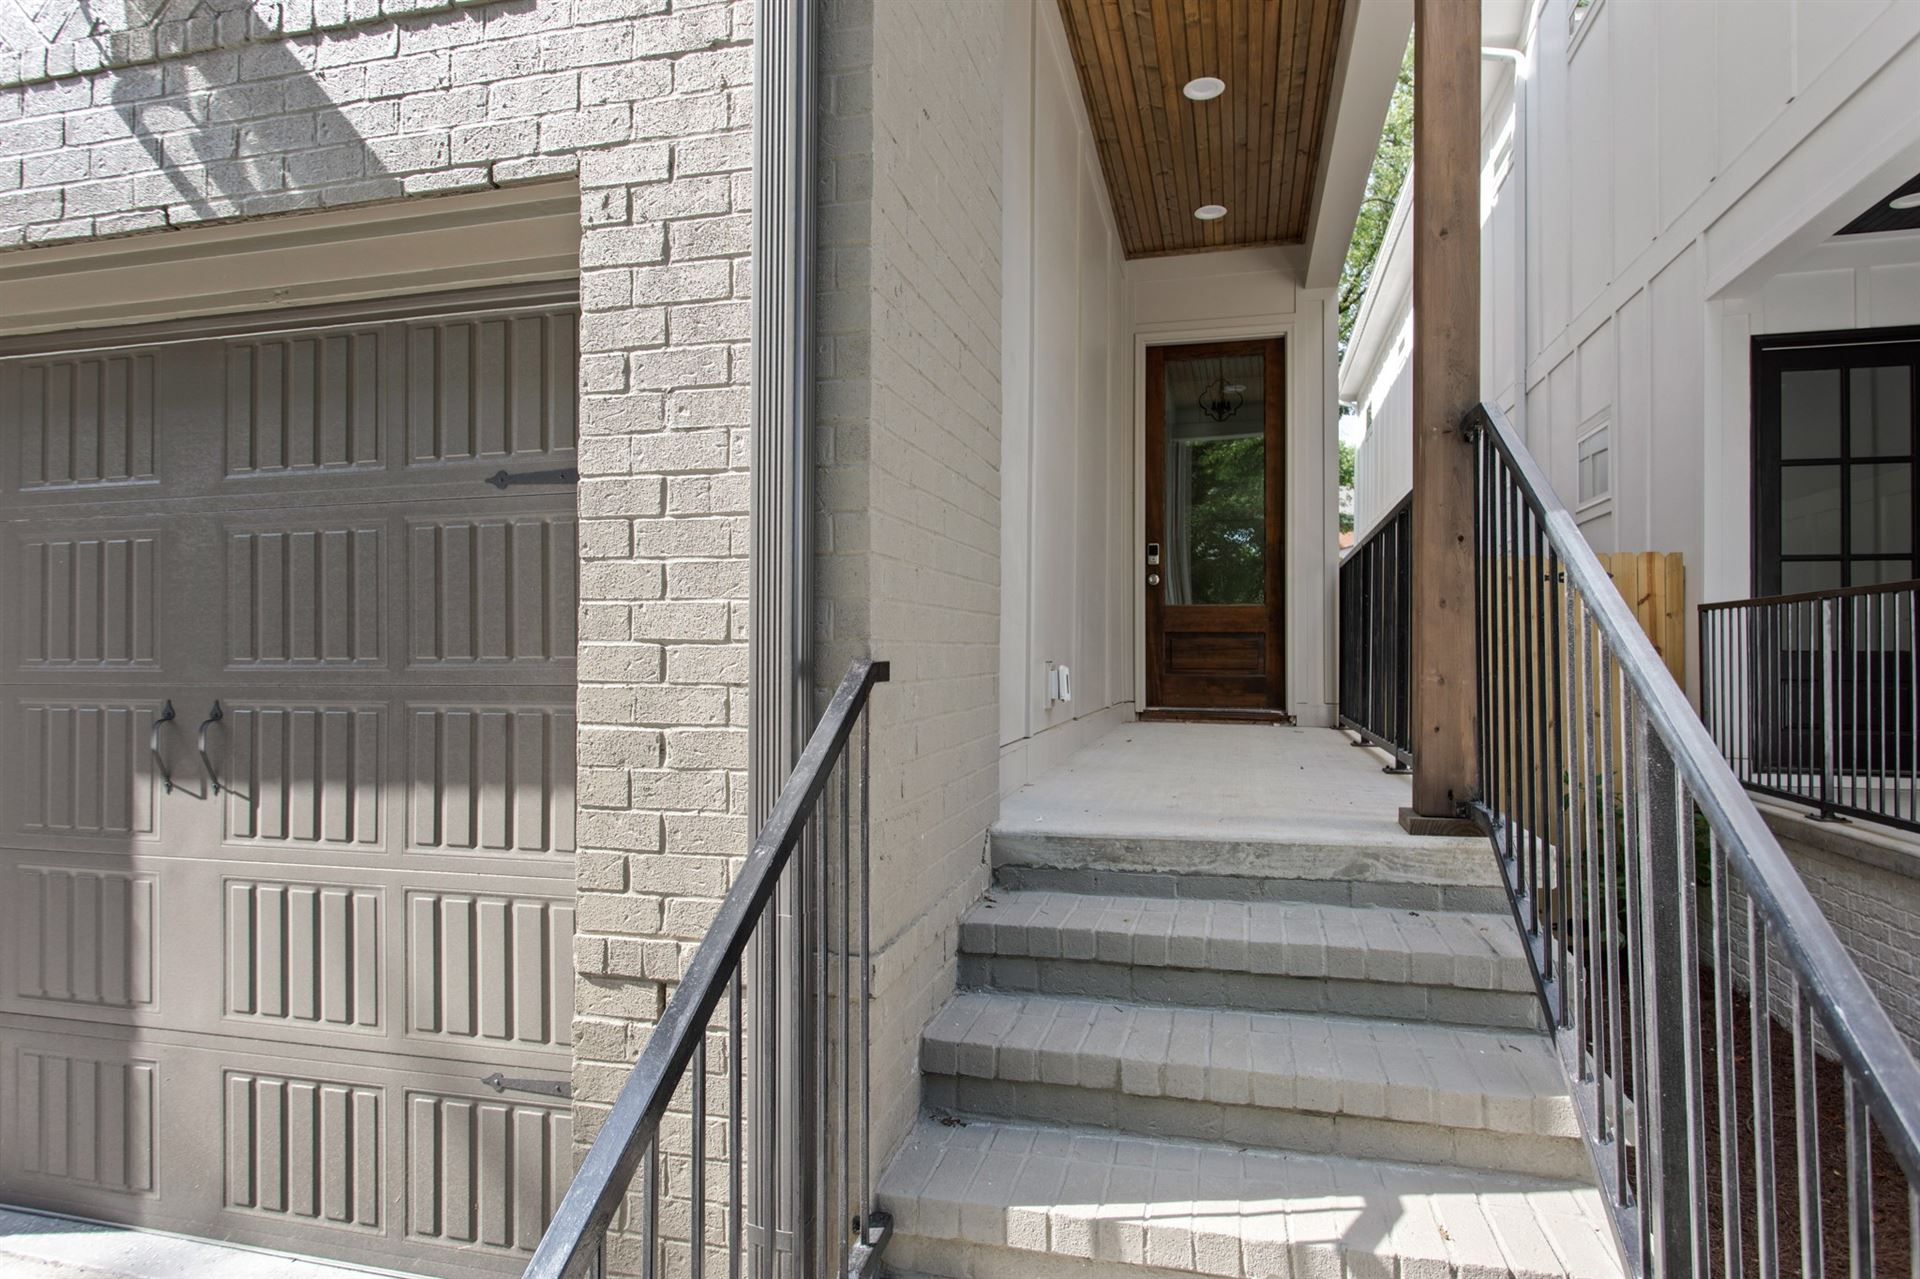 Photo of 1917 Lombardy Ave, Nashville, TN 37215 (MLS # 2168587)